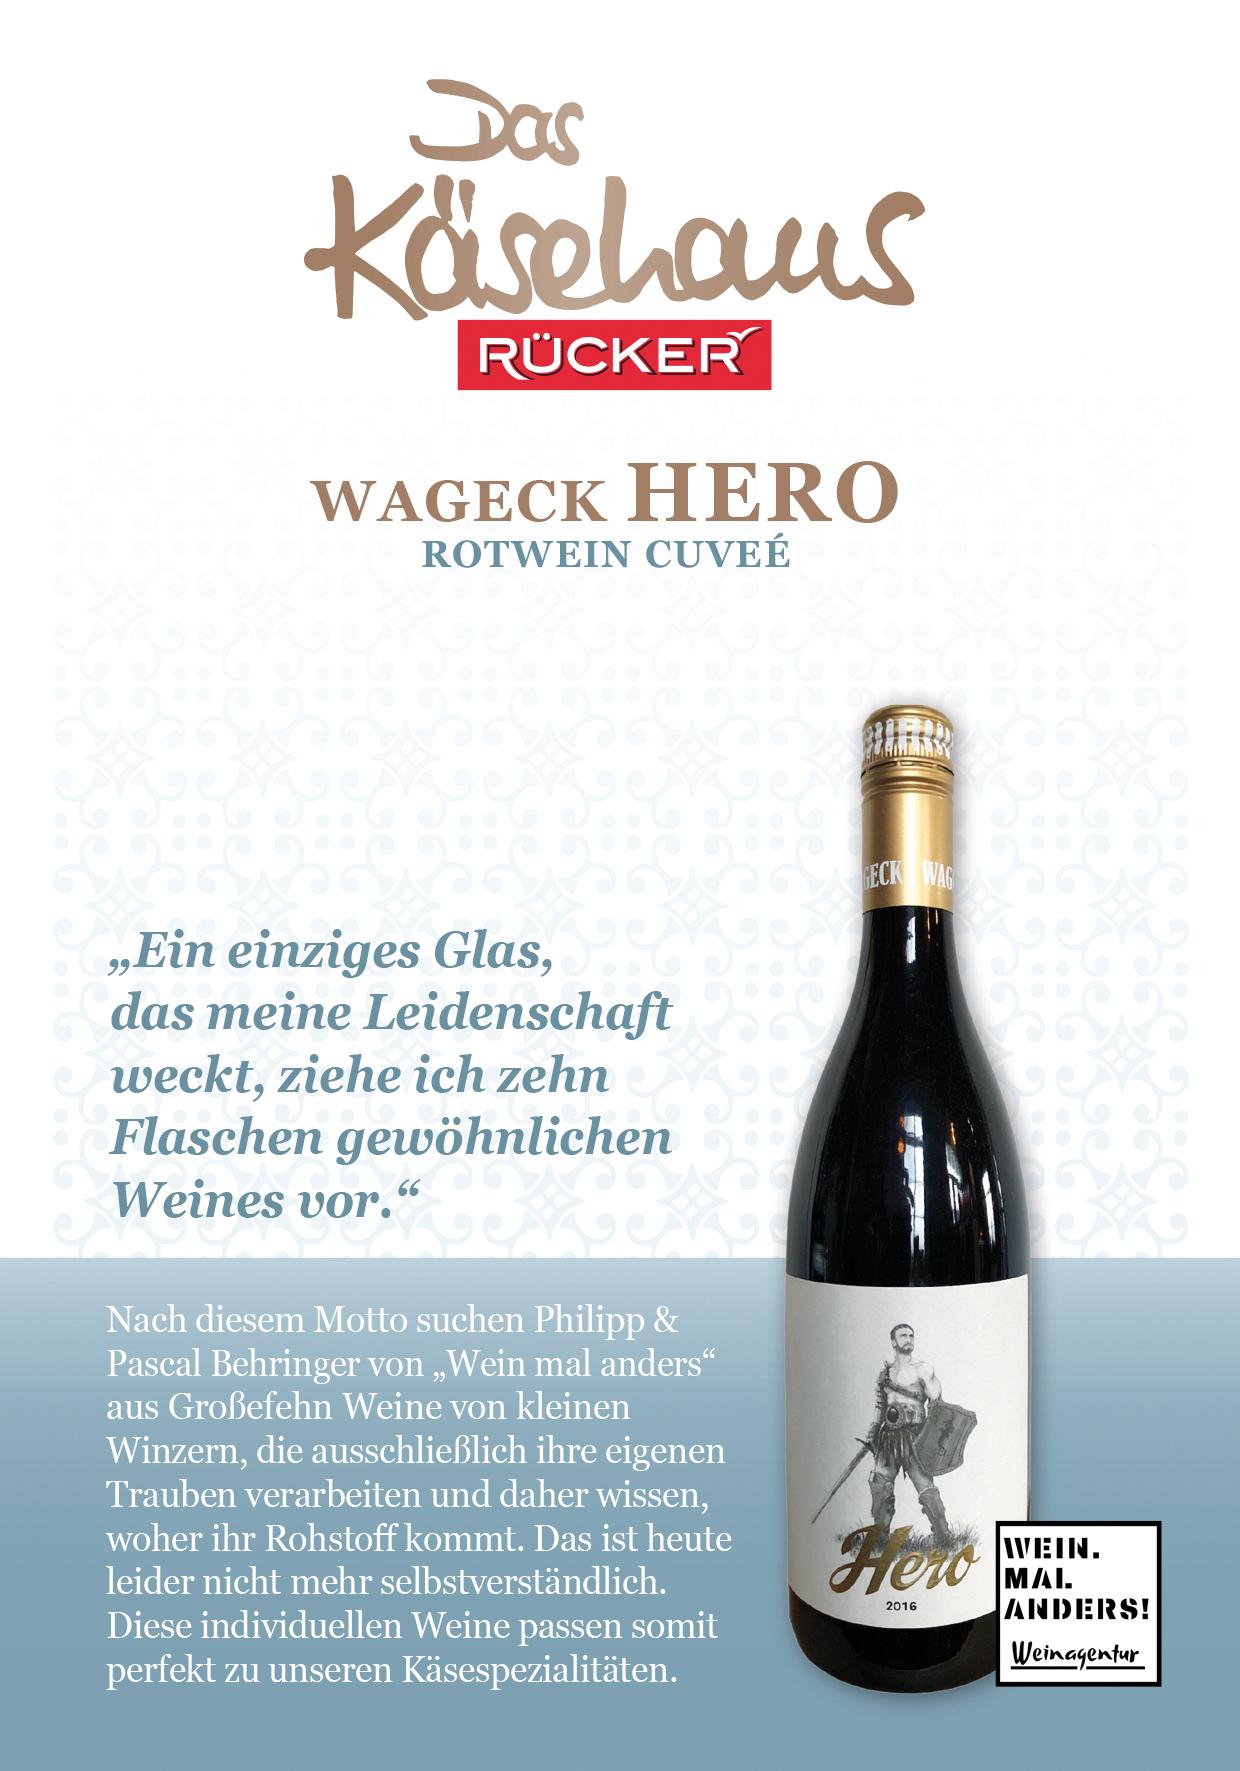 Wageck Hero - Rotwein Cuveé